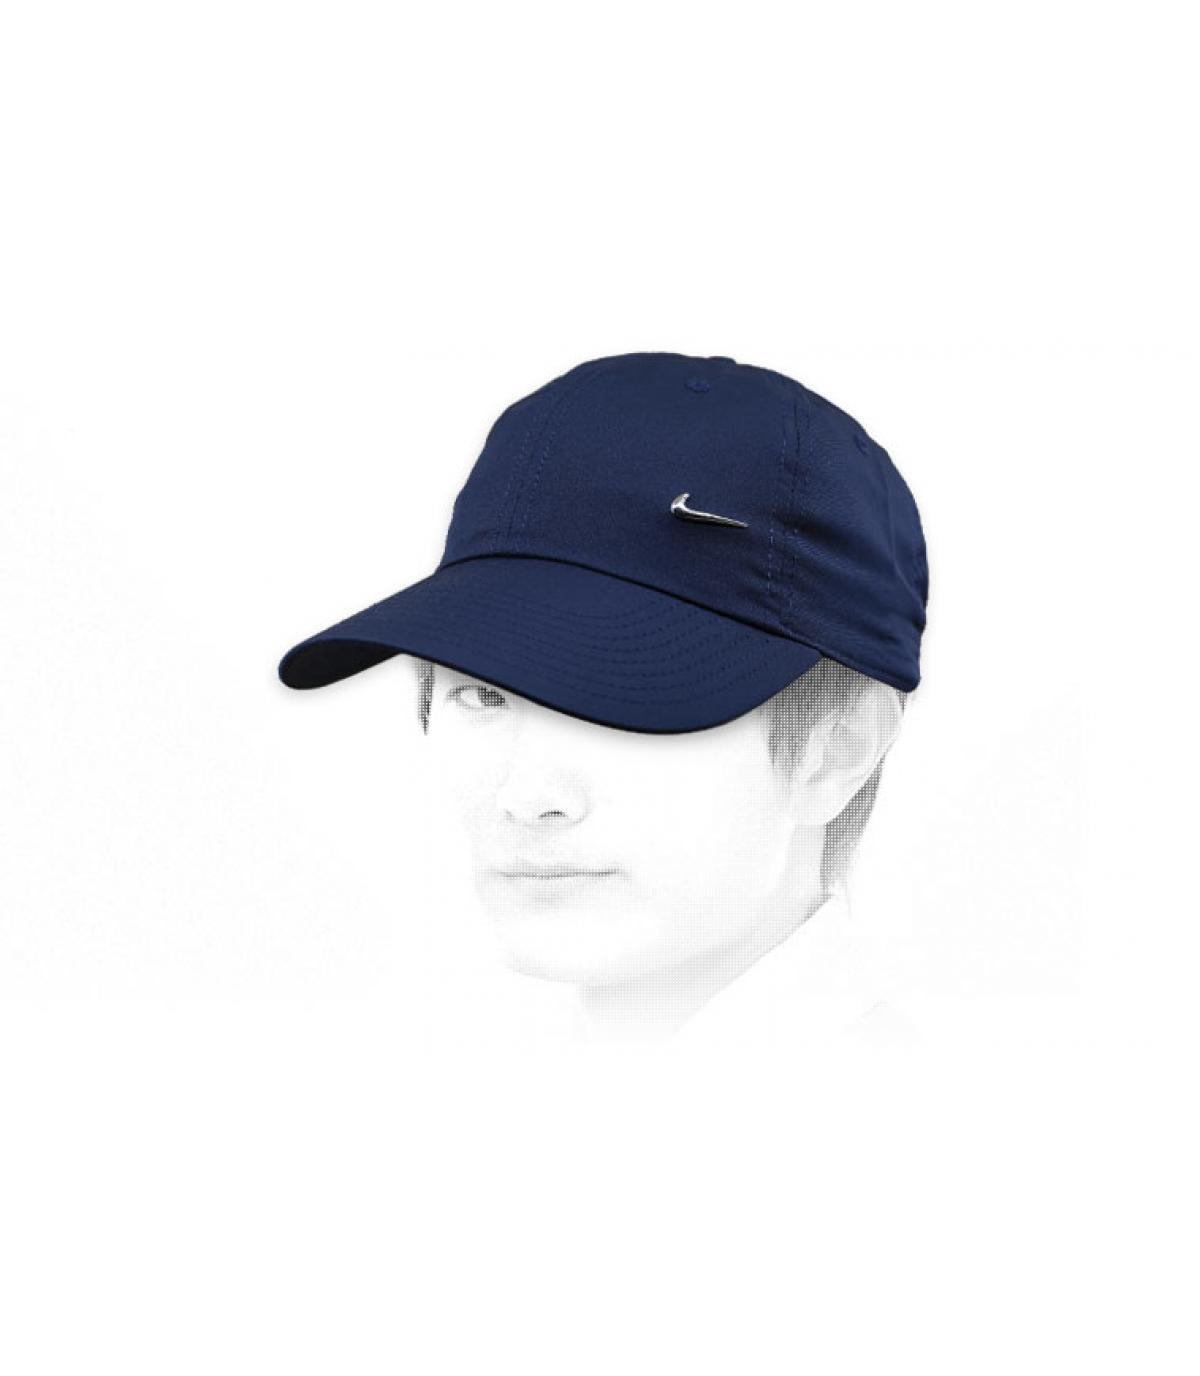 gorra Nike azul marino